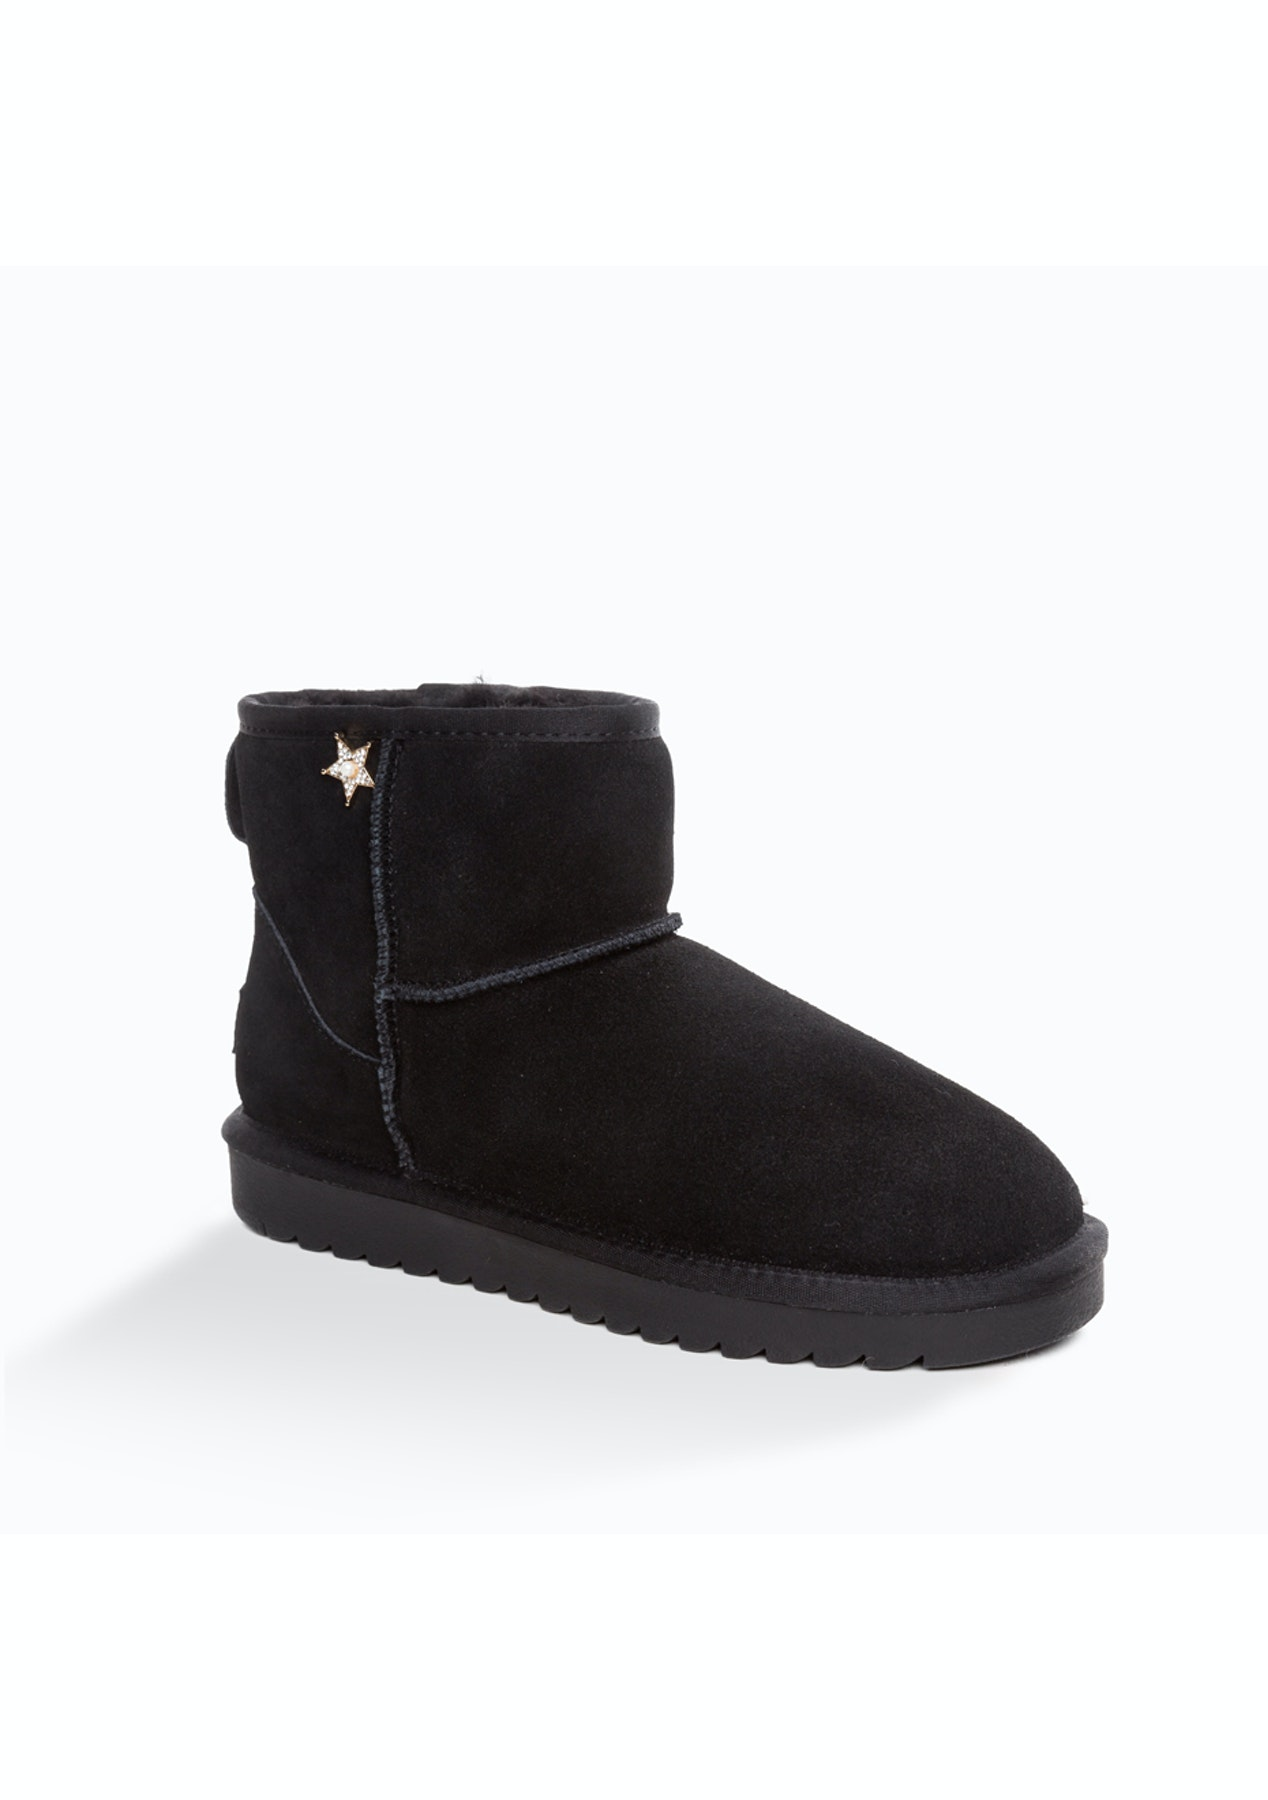 17b70fe209b Ozwear - Ugg Jaylan Mini Boots - Black